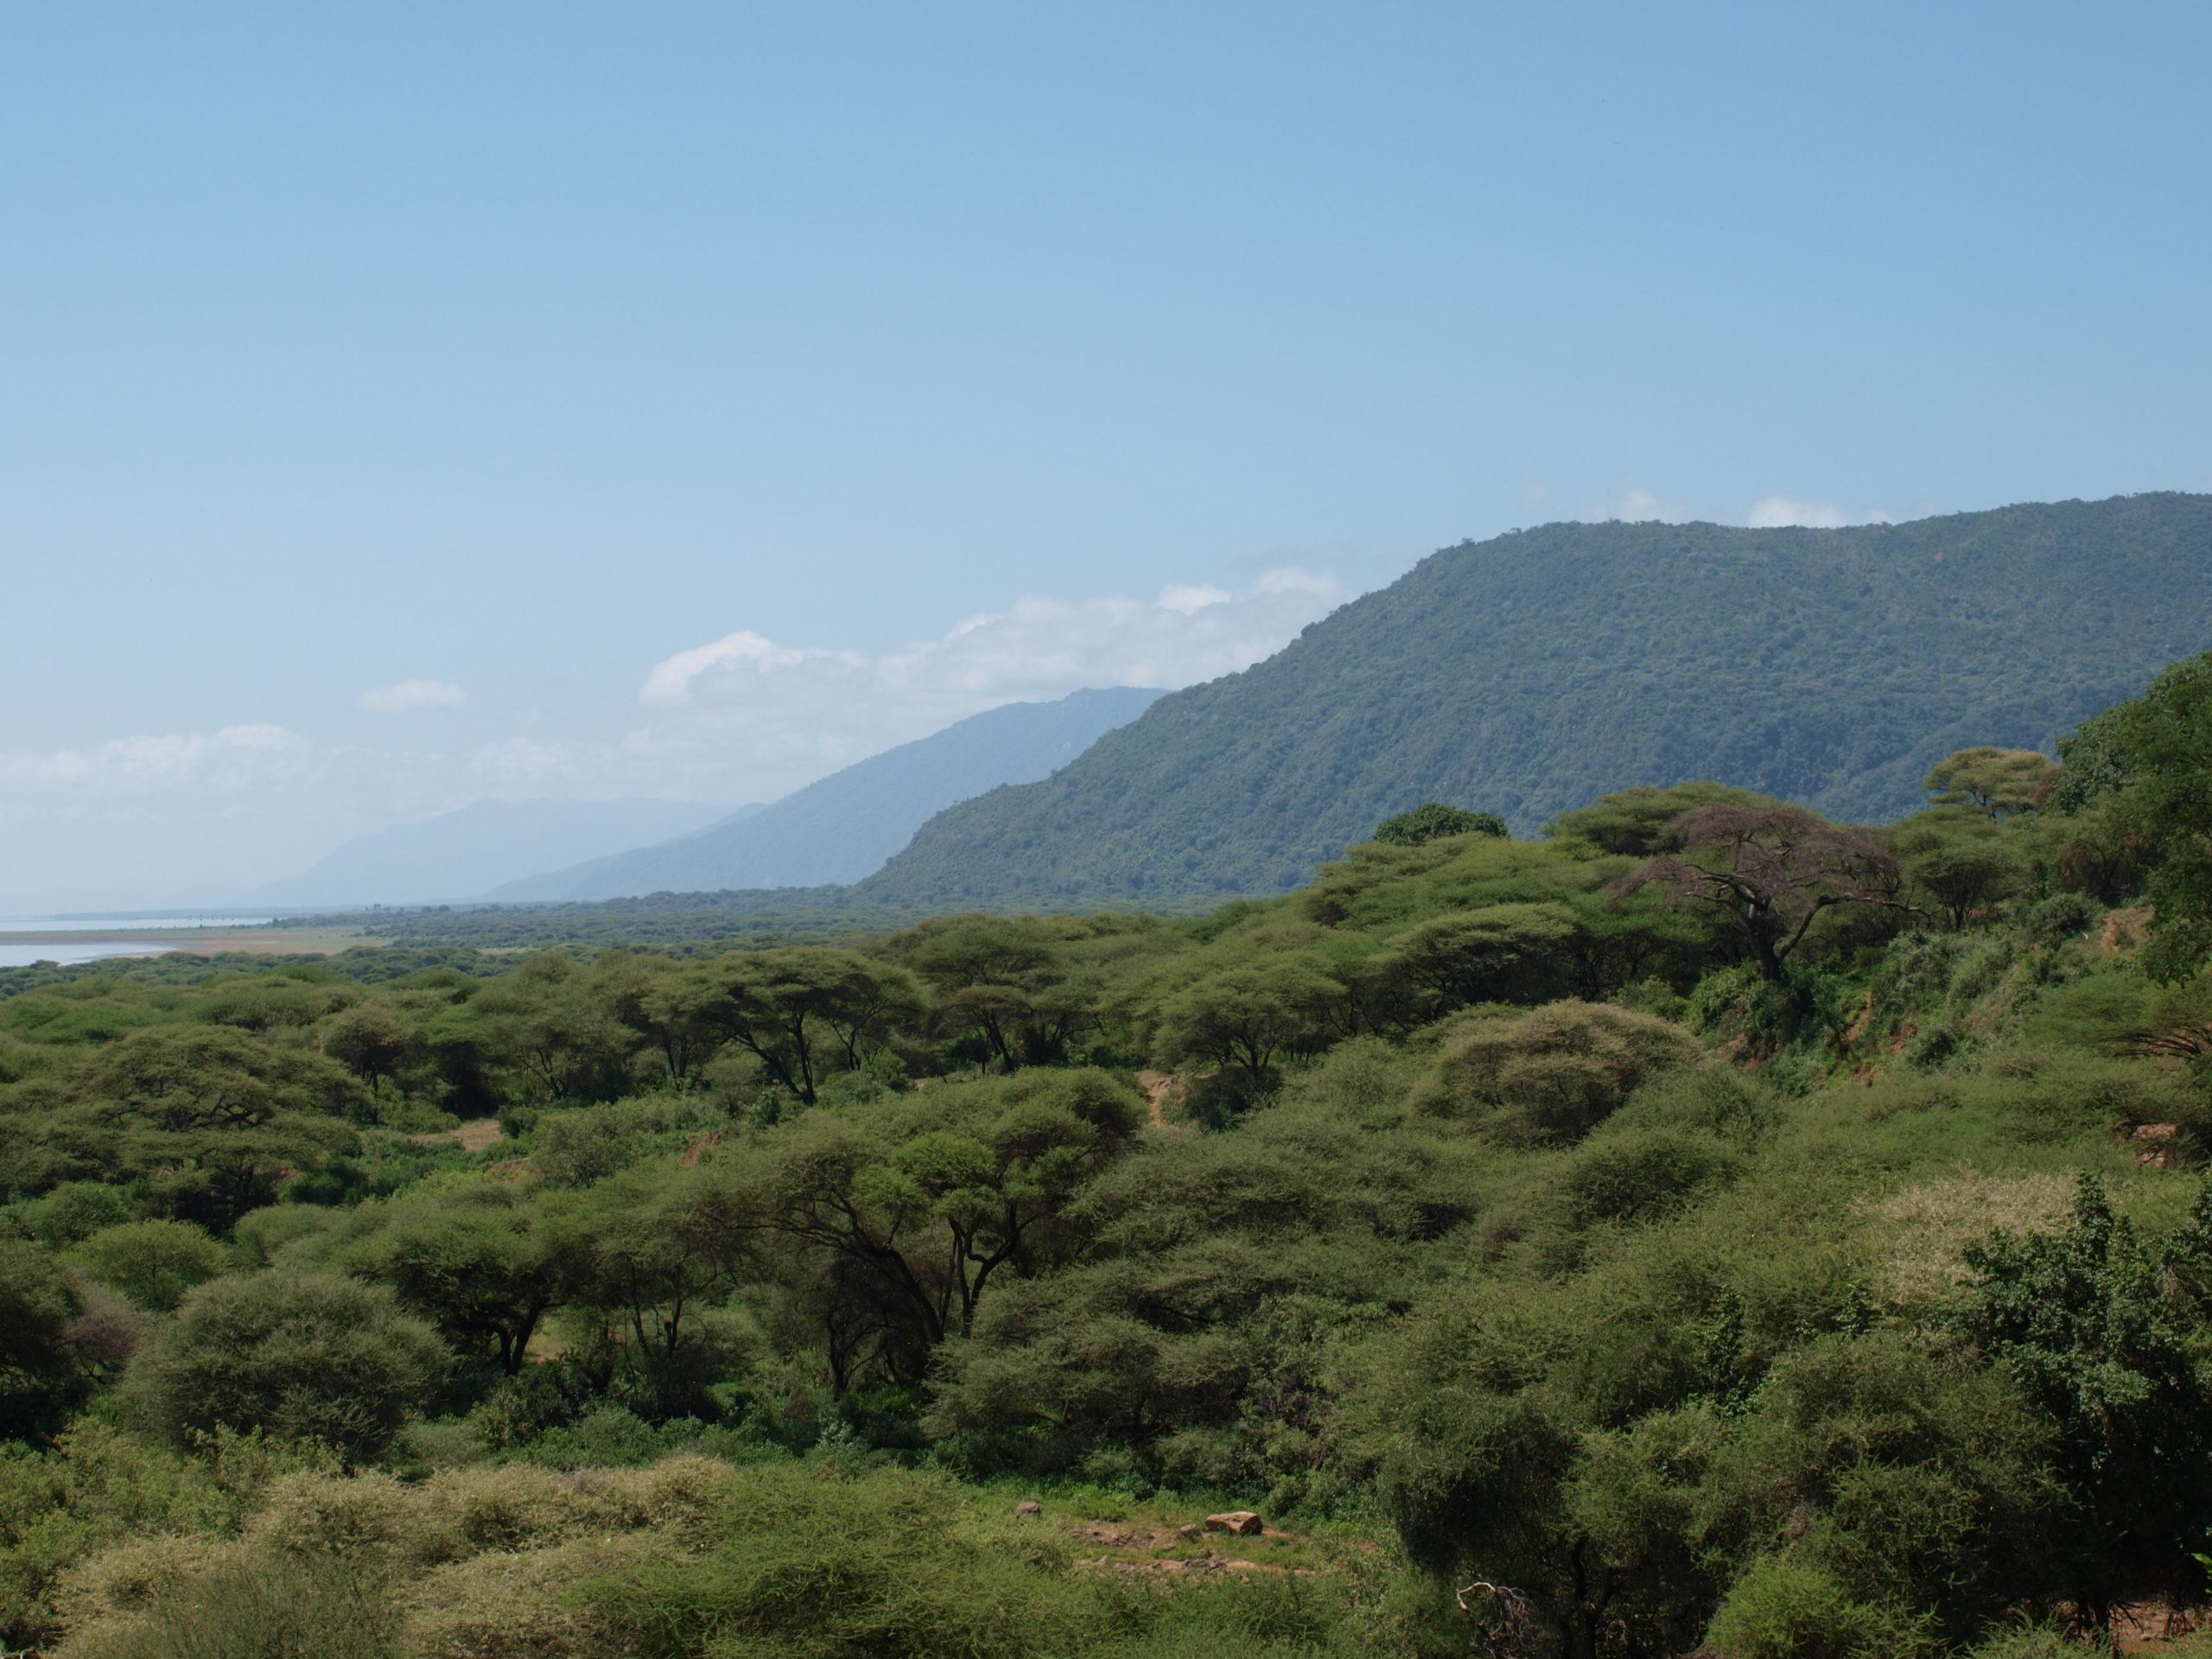 Lake Manyara Rift Valley escarpment